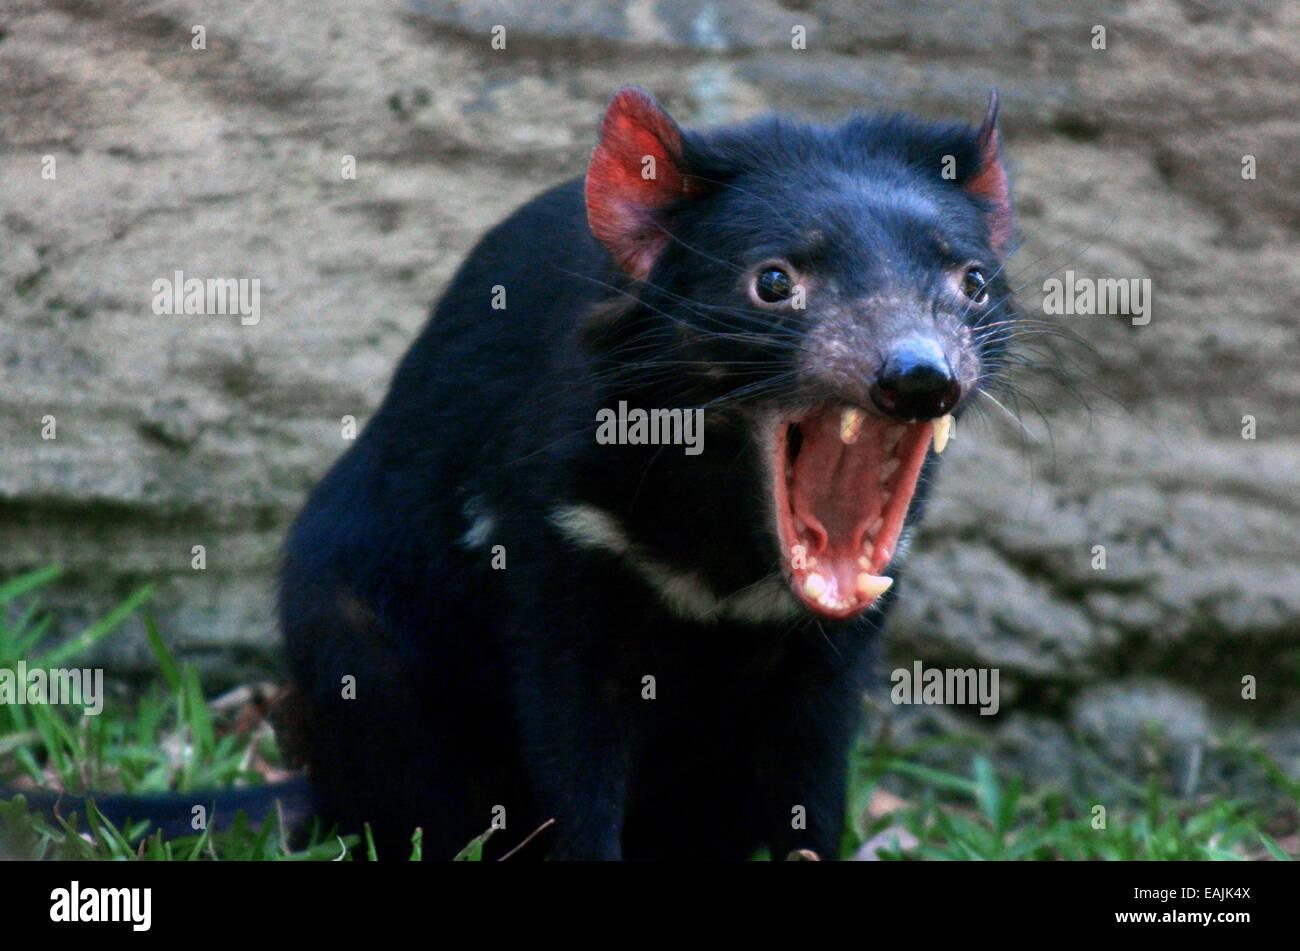 Tasmanian Devil (Sarcophilus harrisii) snarling. - Stock Image